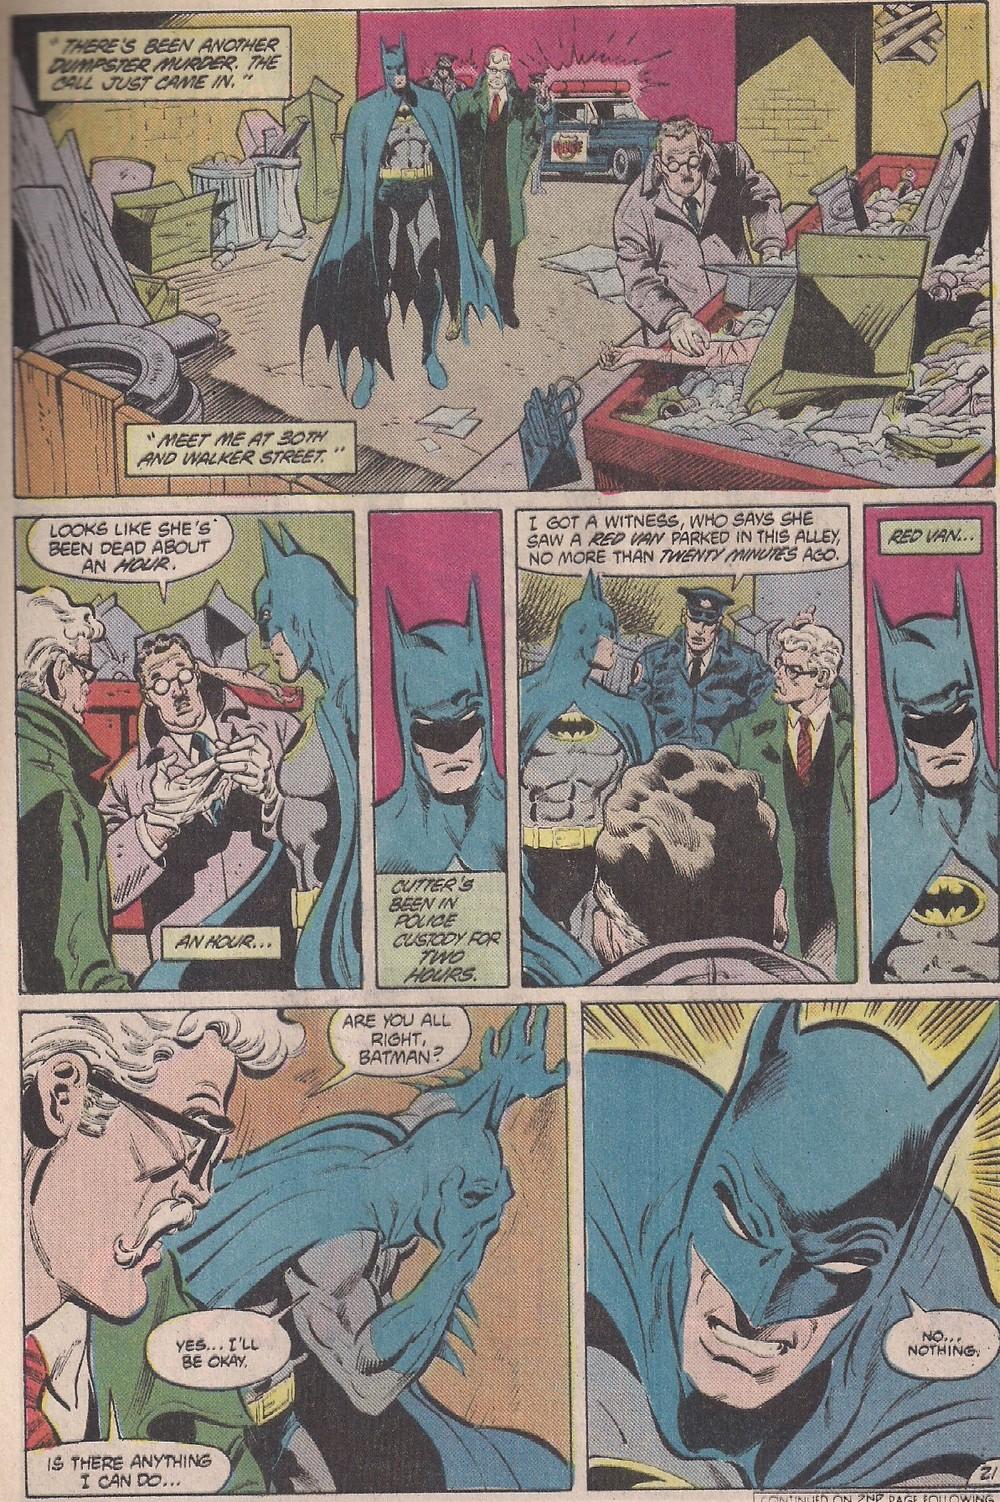 And now we've seen the Batman fail.